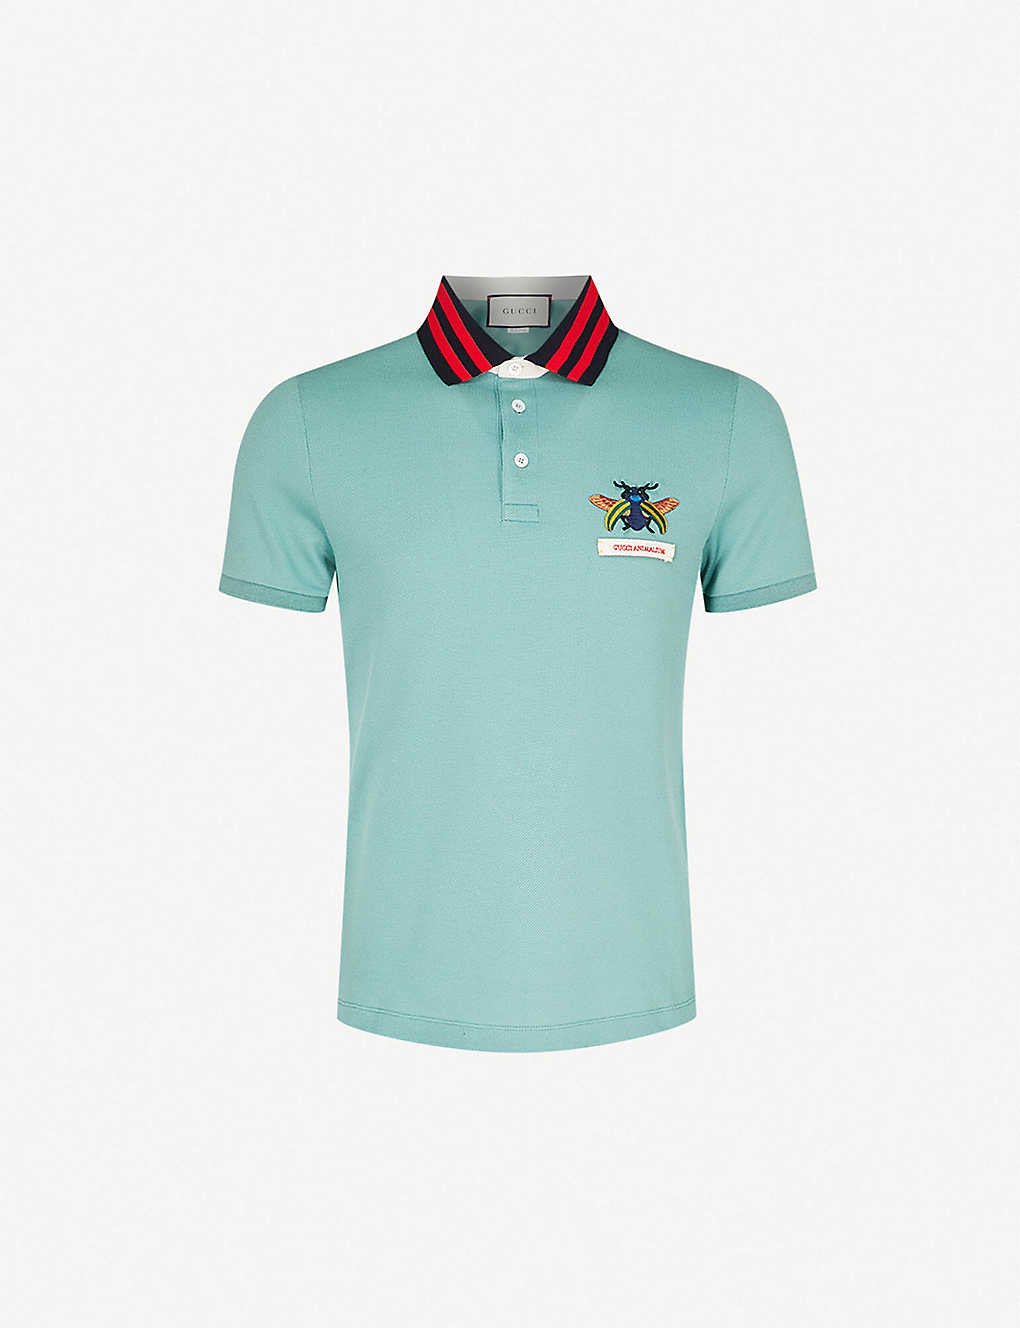 687abc0a3b9 GUCCI - Gucci Animalium stretch-cotton polo shirt